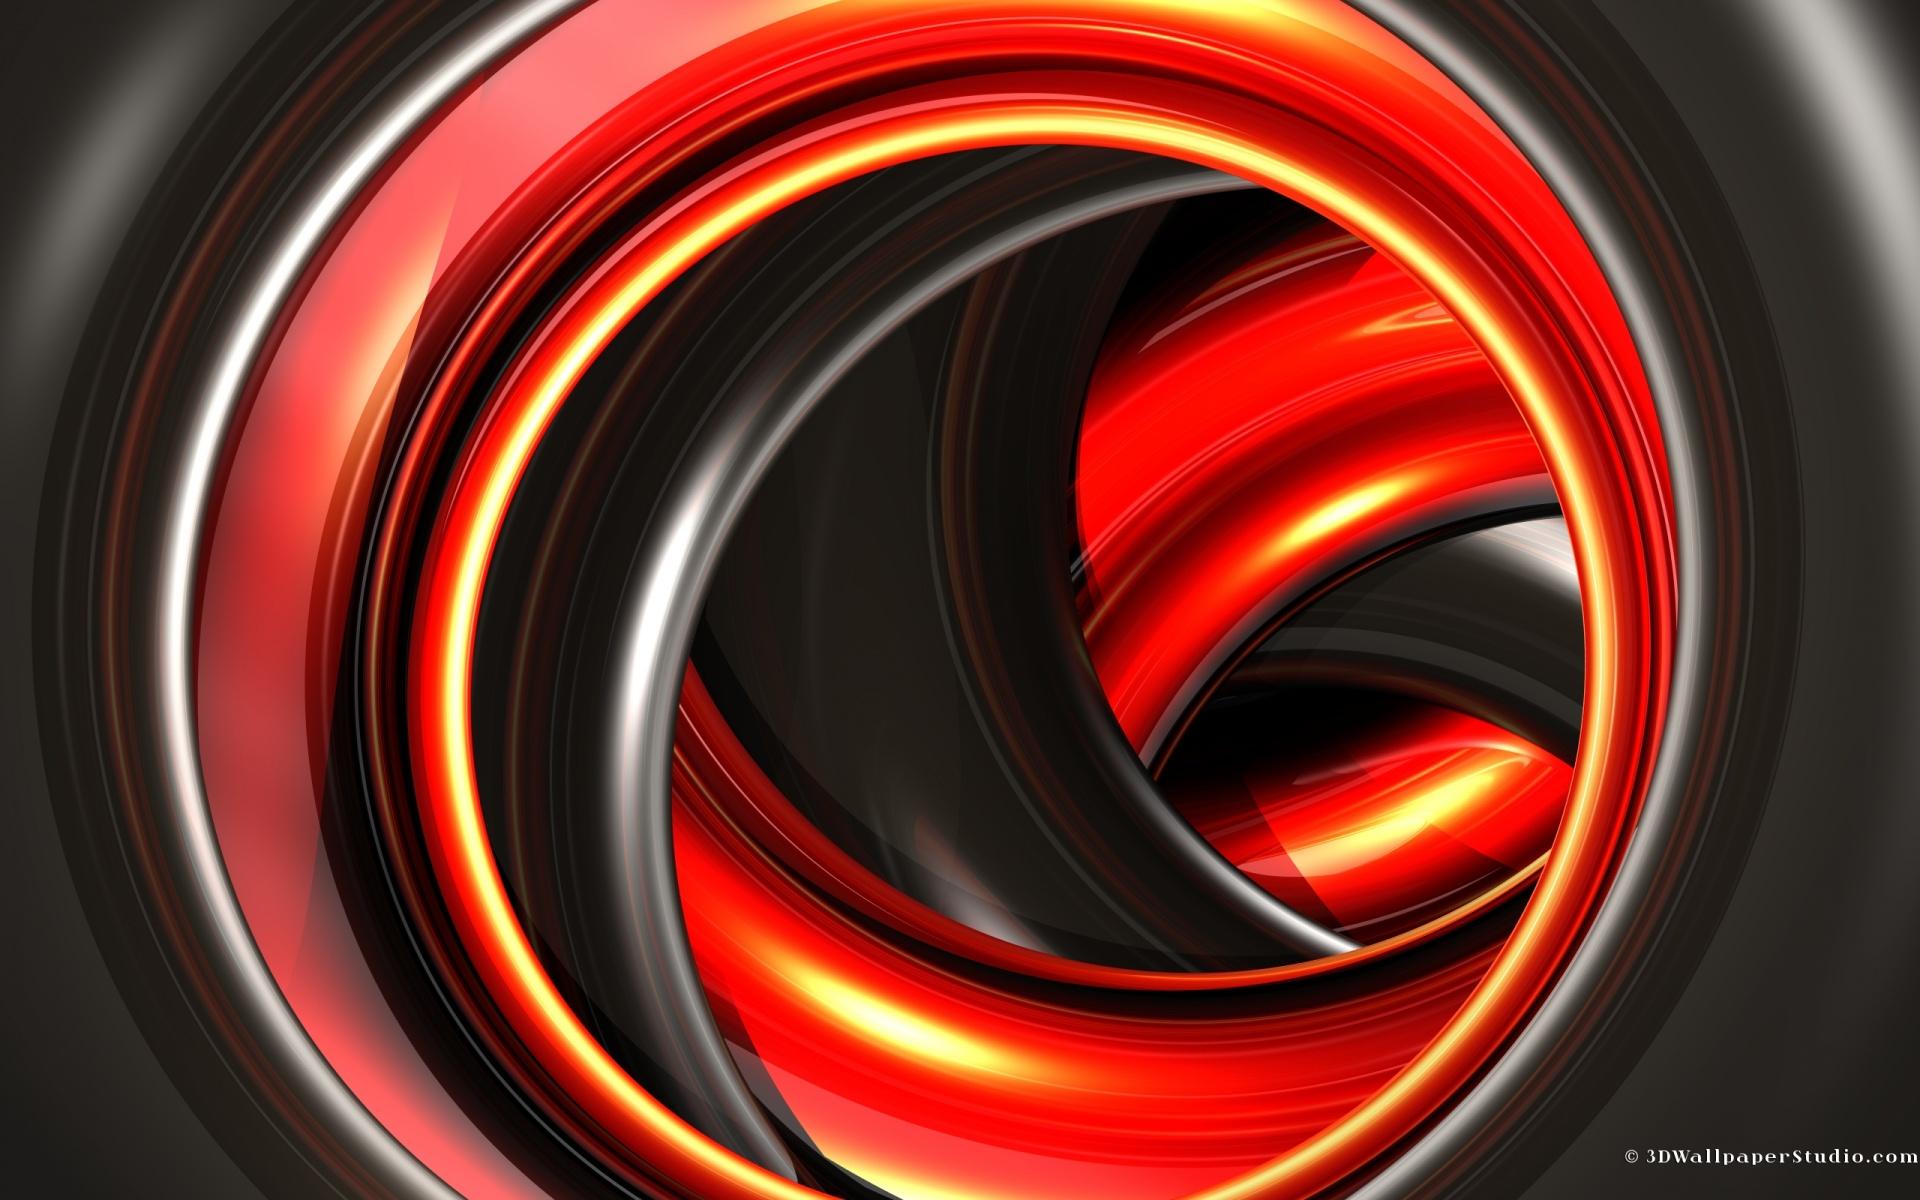 Black And Red Abstract Wallpaper - WallpaperSafari